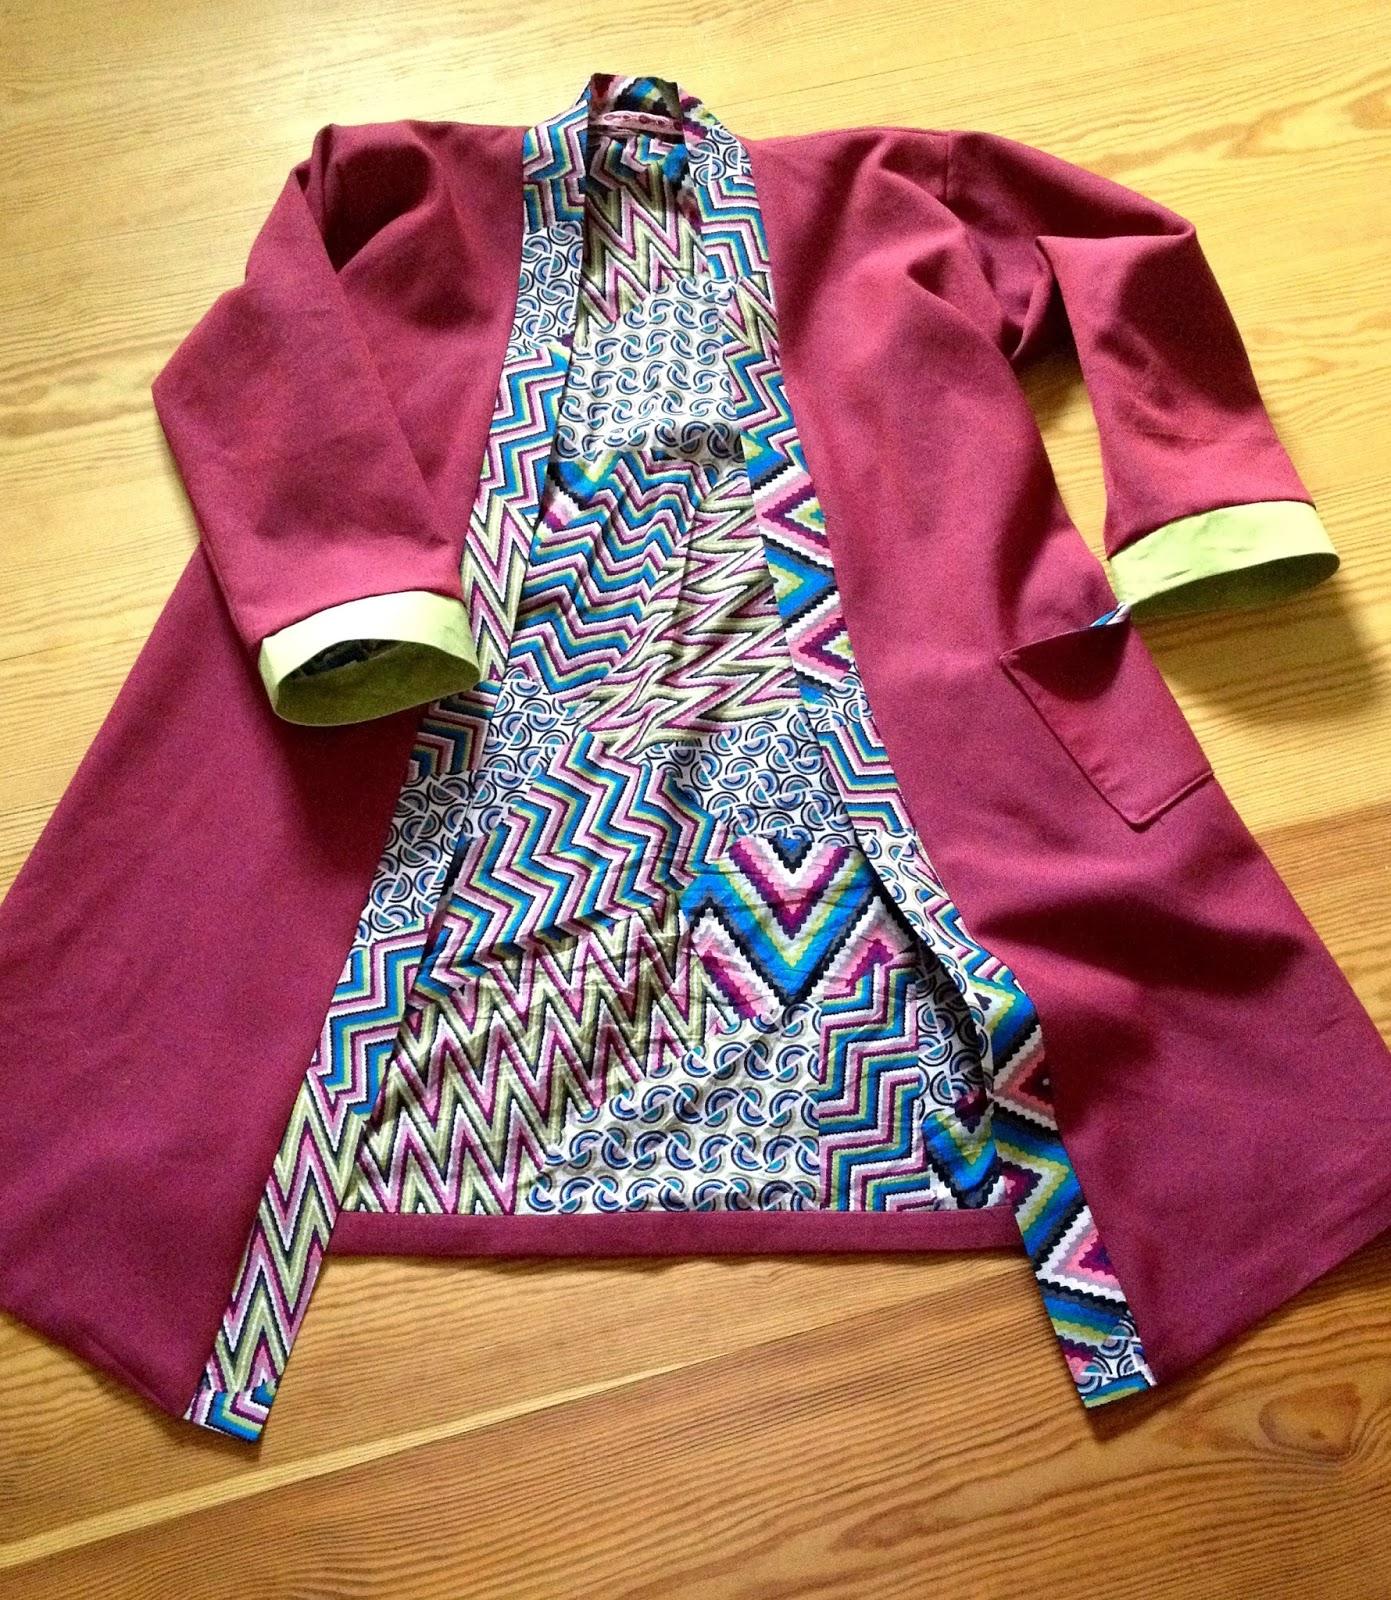 floh stiche kimono morgenmantel frucht des gestrigen. Black Bedroom Furniture Sets. Home Design Ideas